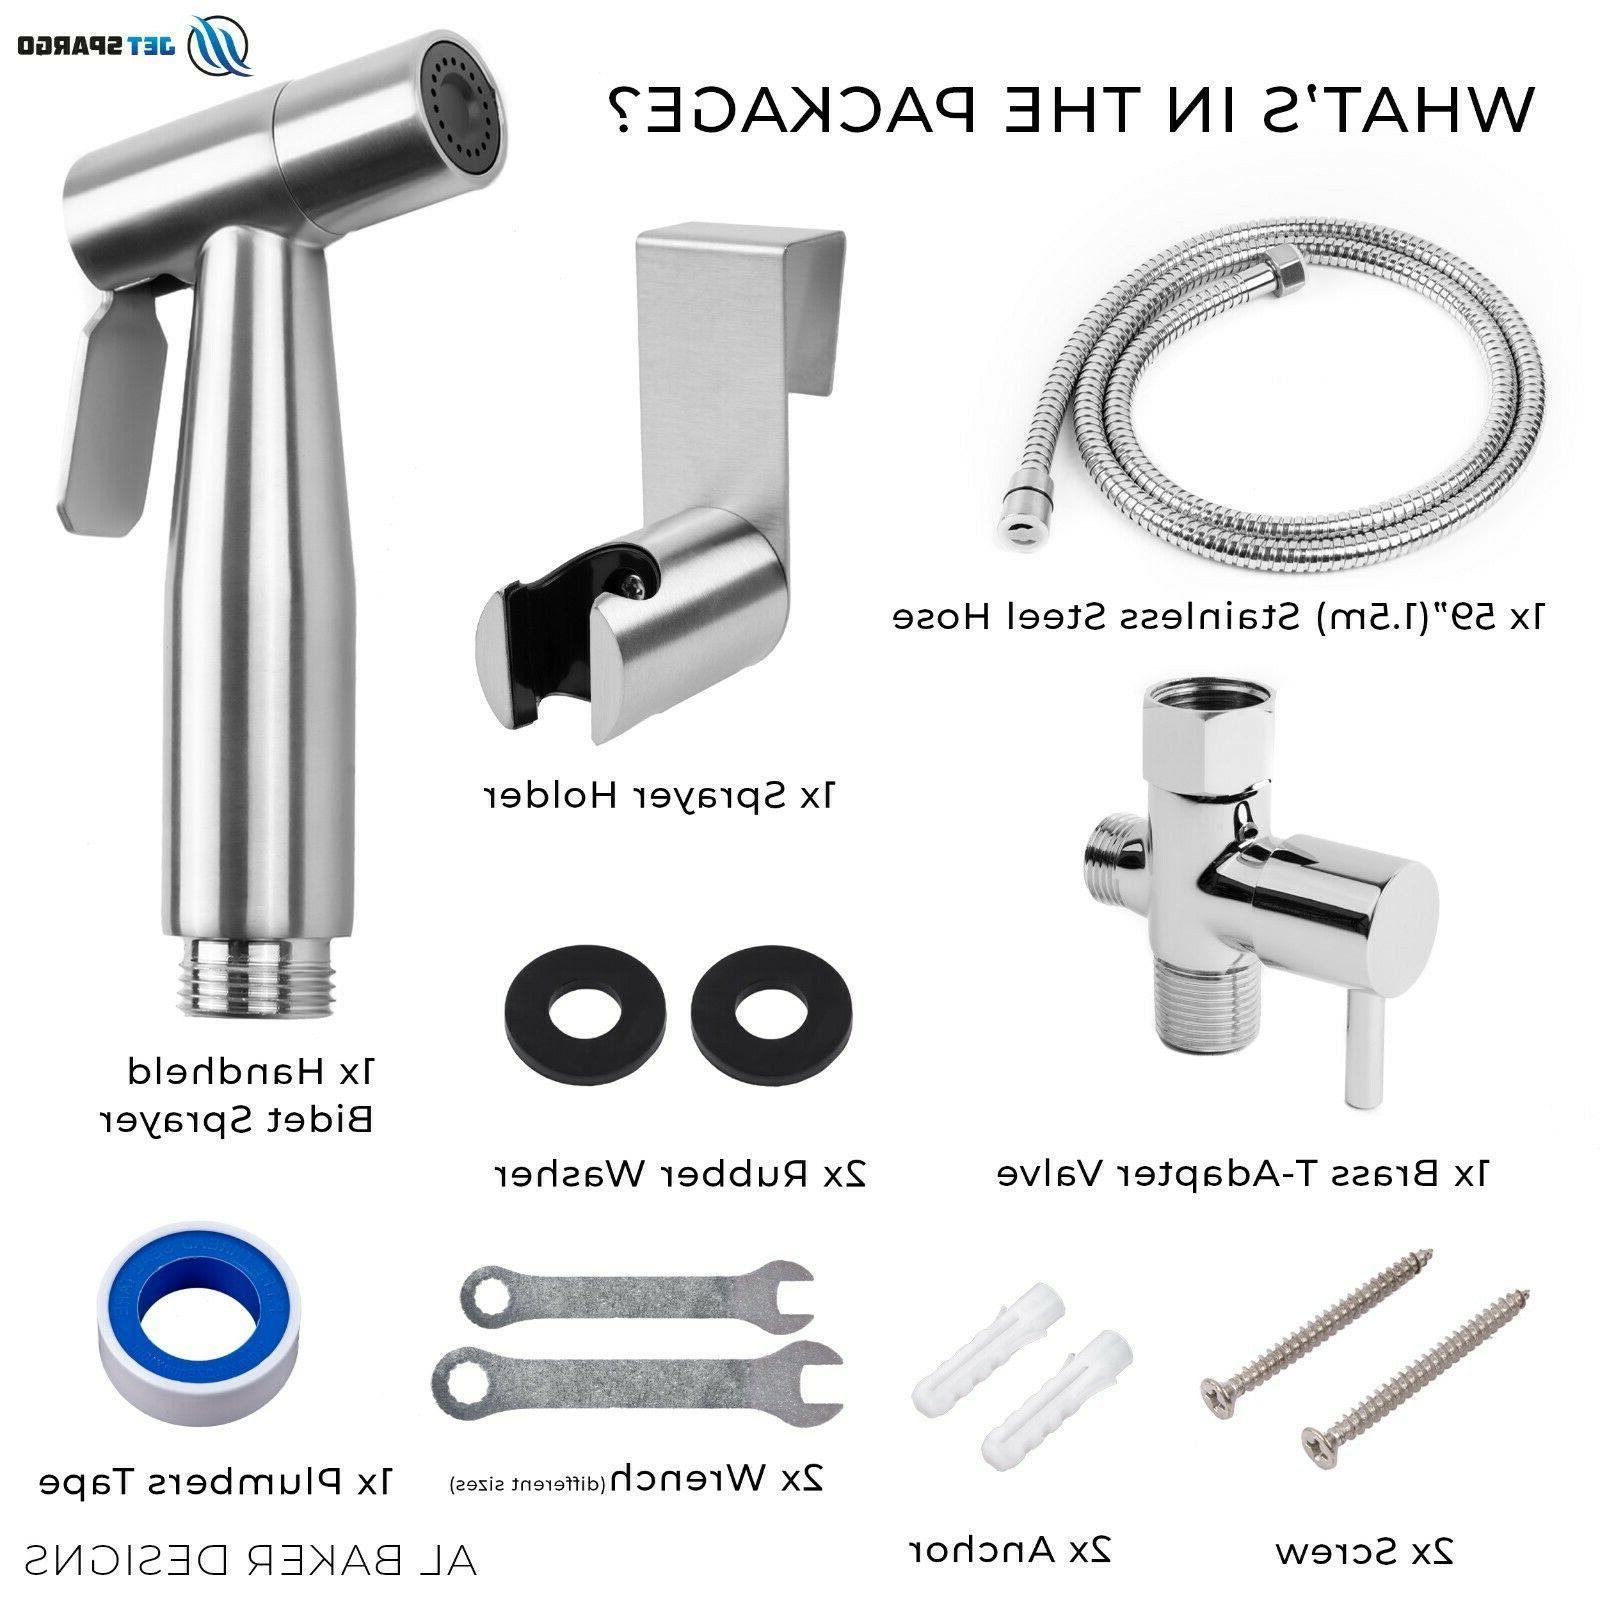 JET SPARGO Held Toilet Bidet Sprayer Shower Kit Adaptor